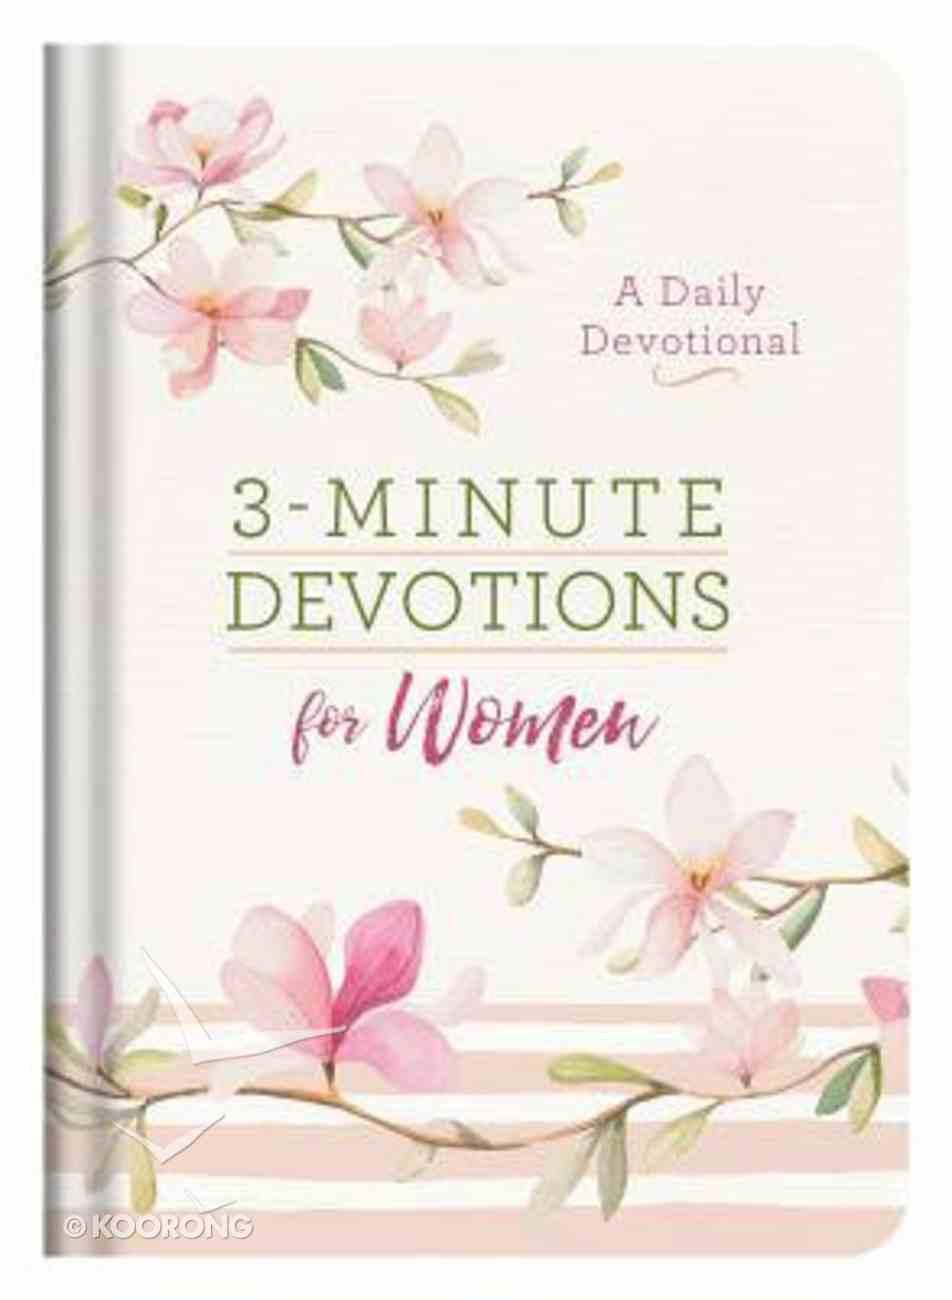 3md: For Women - a Daily Devotional Hardback